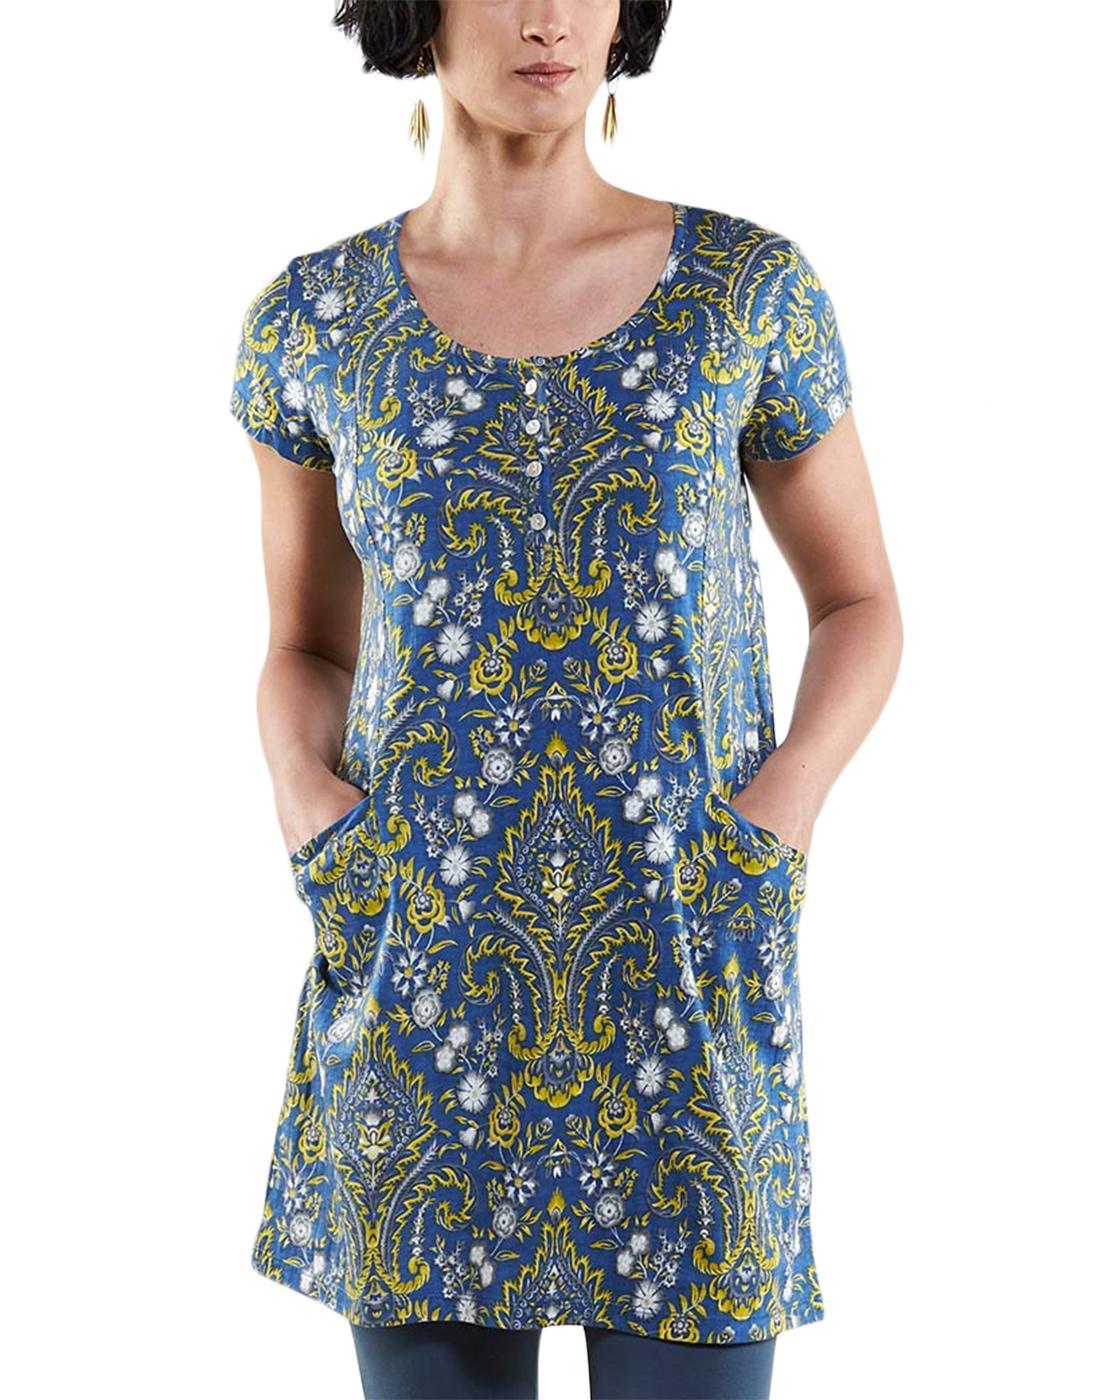 NOMADS Retro 60s Paisley Mod Henley Tunic Dress